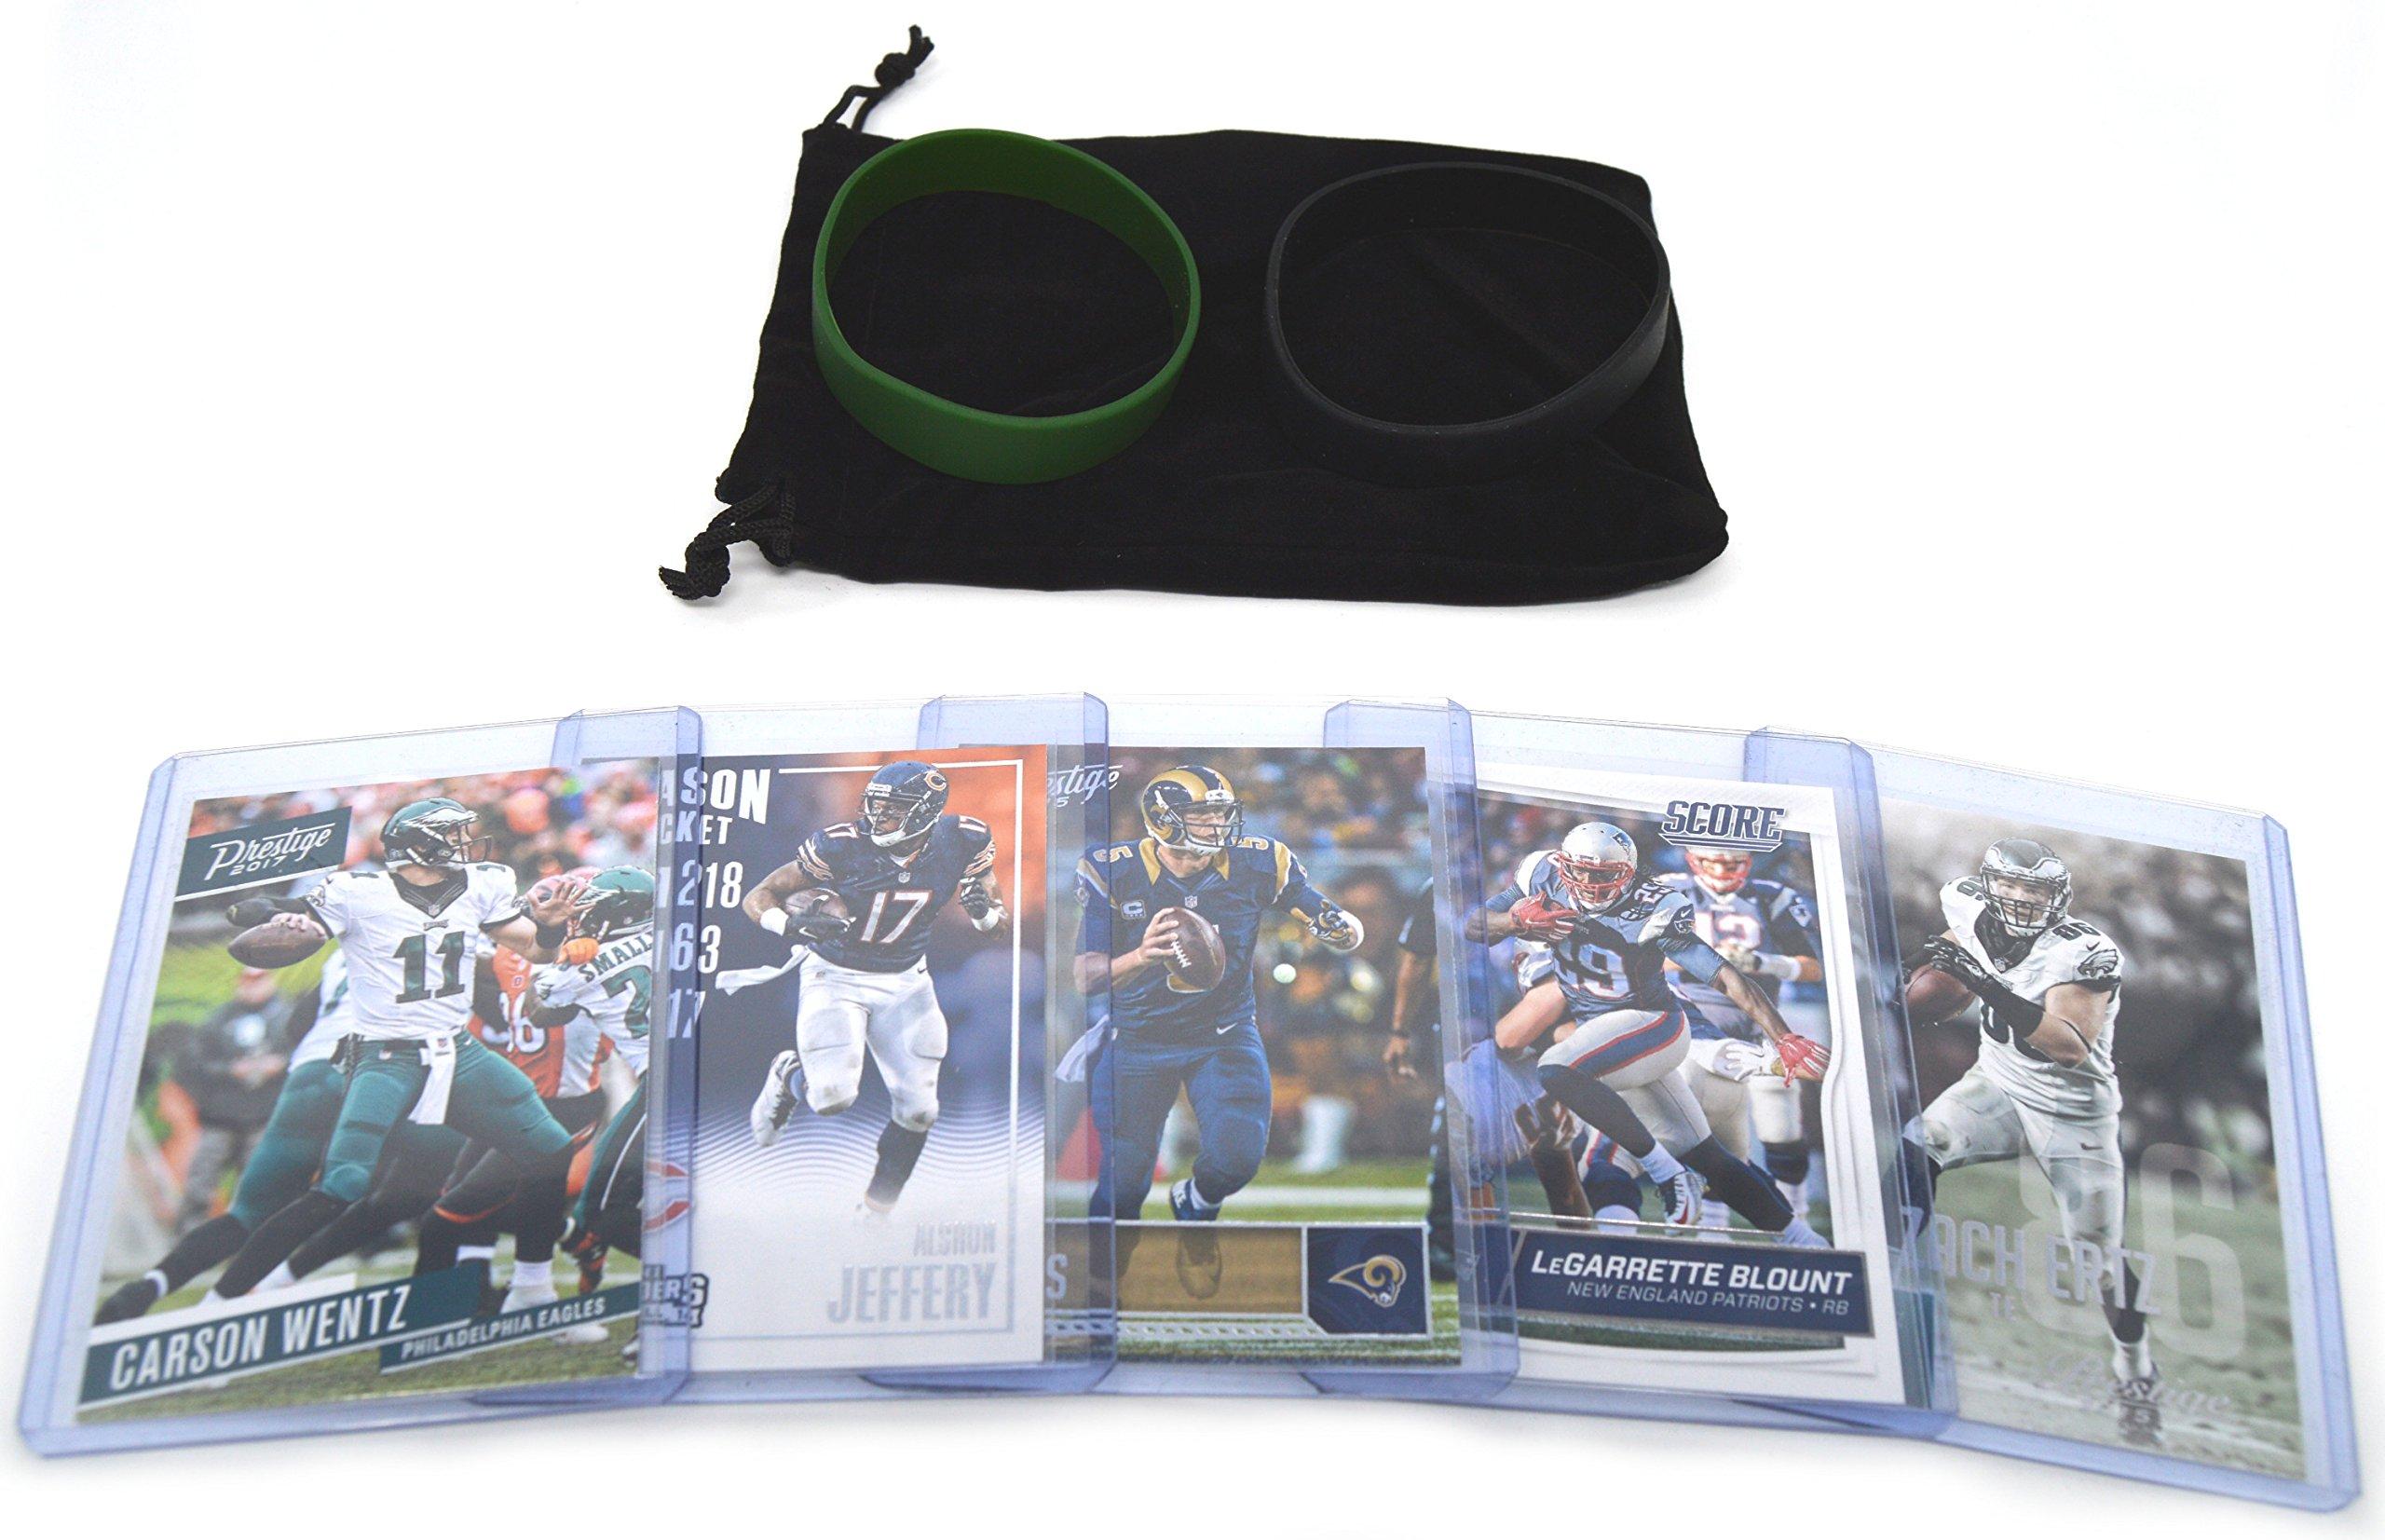 Philadelphia Eagles Cards: Carson Wentz, Nick Foles, Alshon Jeffery, Jay Ajayi, Zach Ertz ASSORTED Trading Cards and Wristbands Bundle